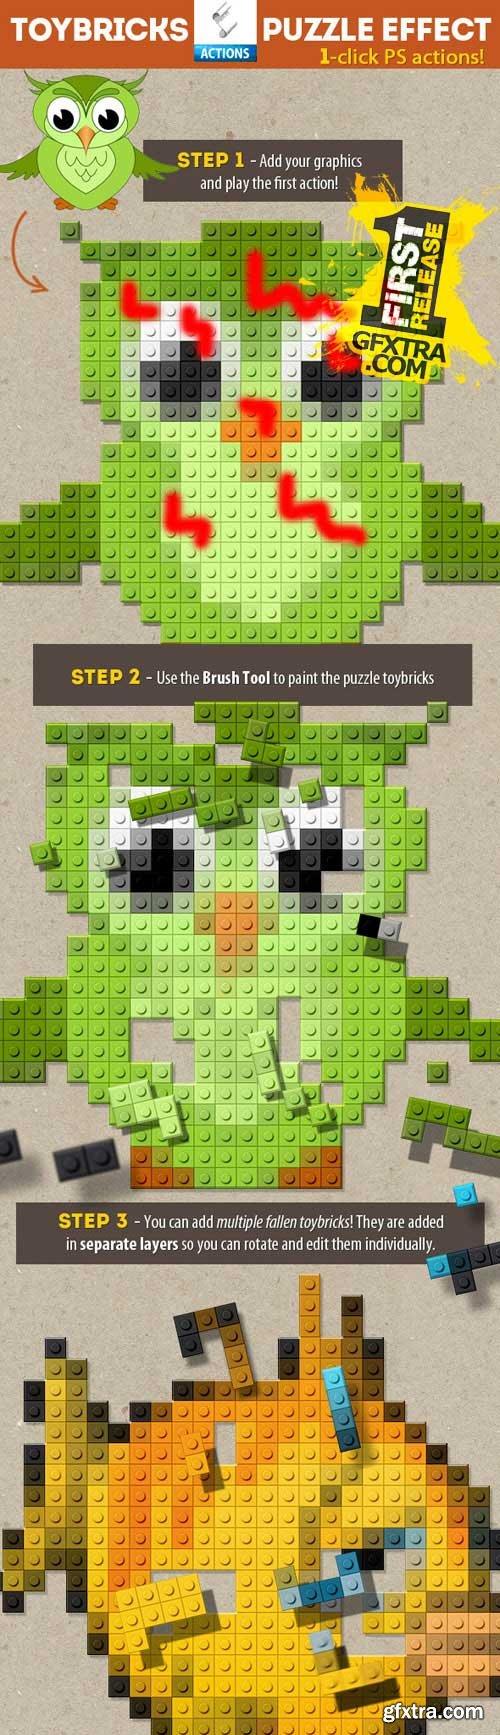 GraphicRiver - Lego Toy Bricks Puzzle Photoshop Actions 9337194